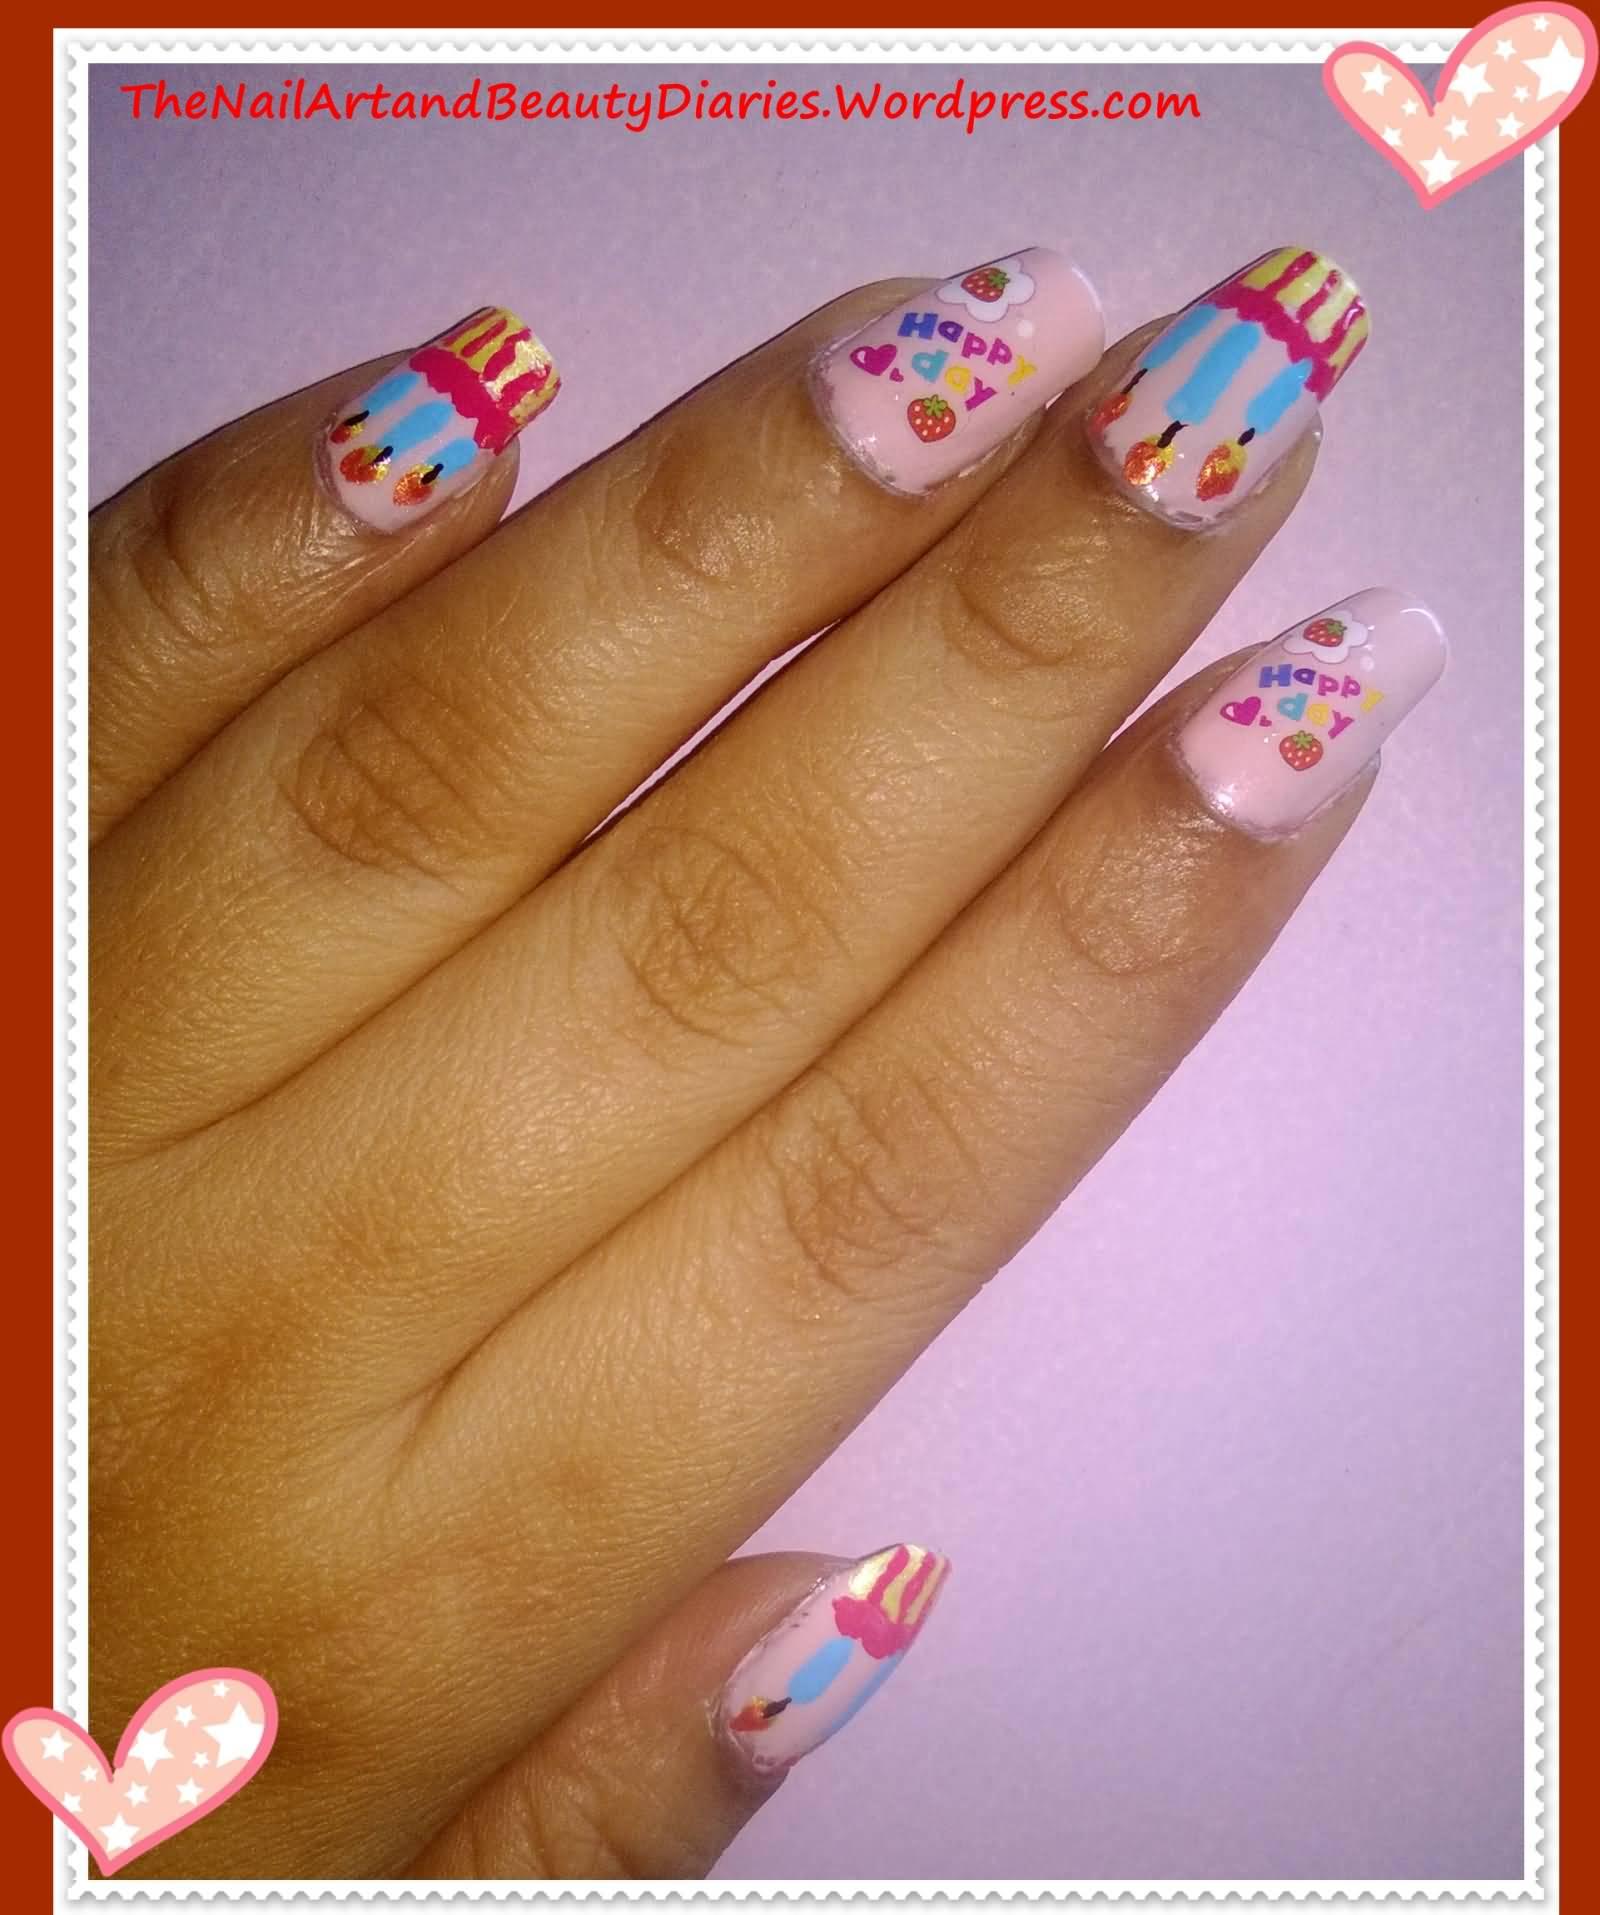 Easy Nail Designs For Birthdays: Birthday nail art easy ideas. Cute ...